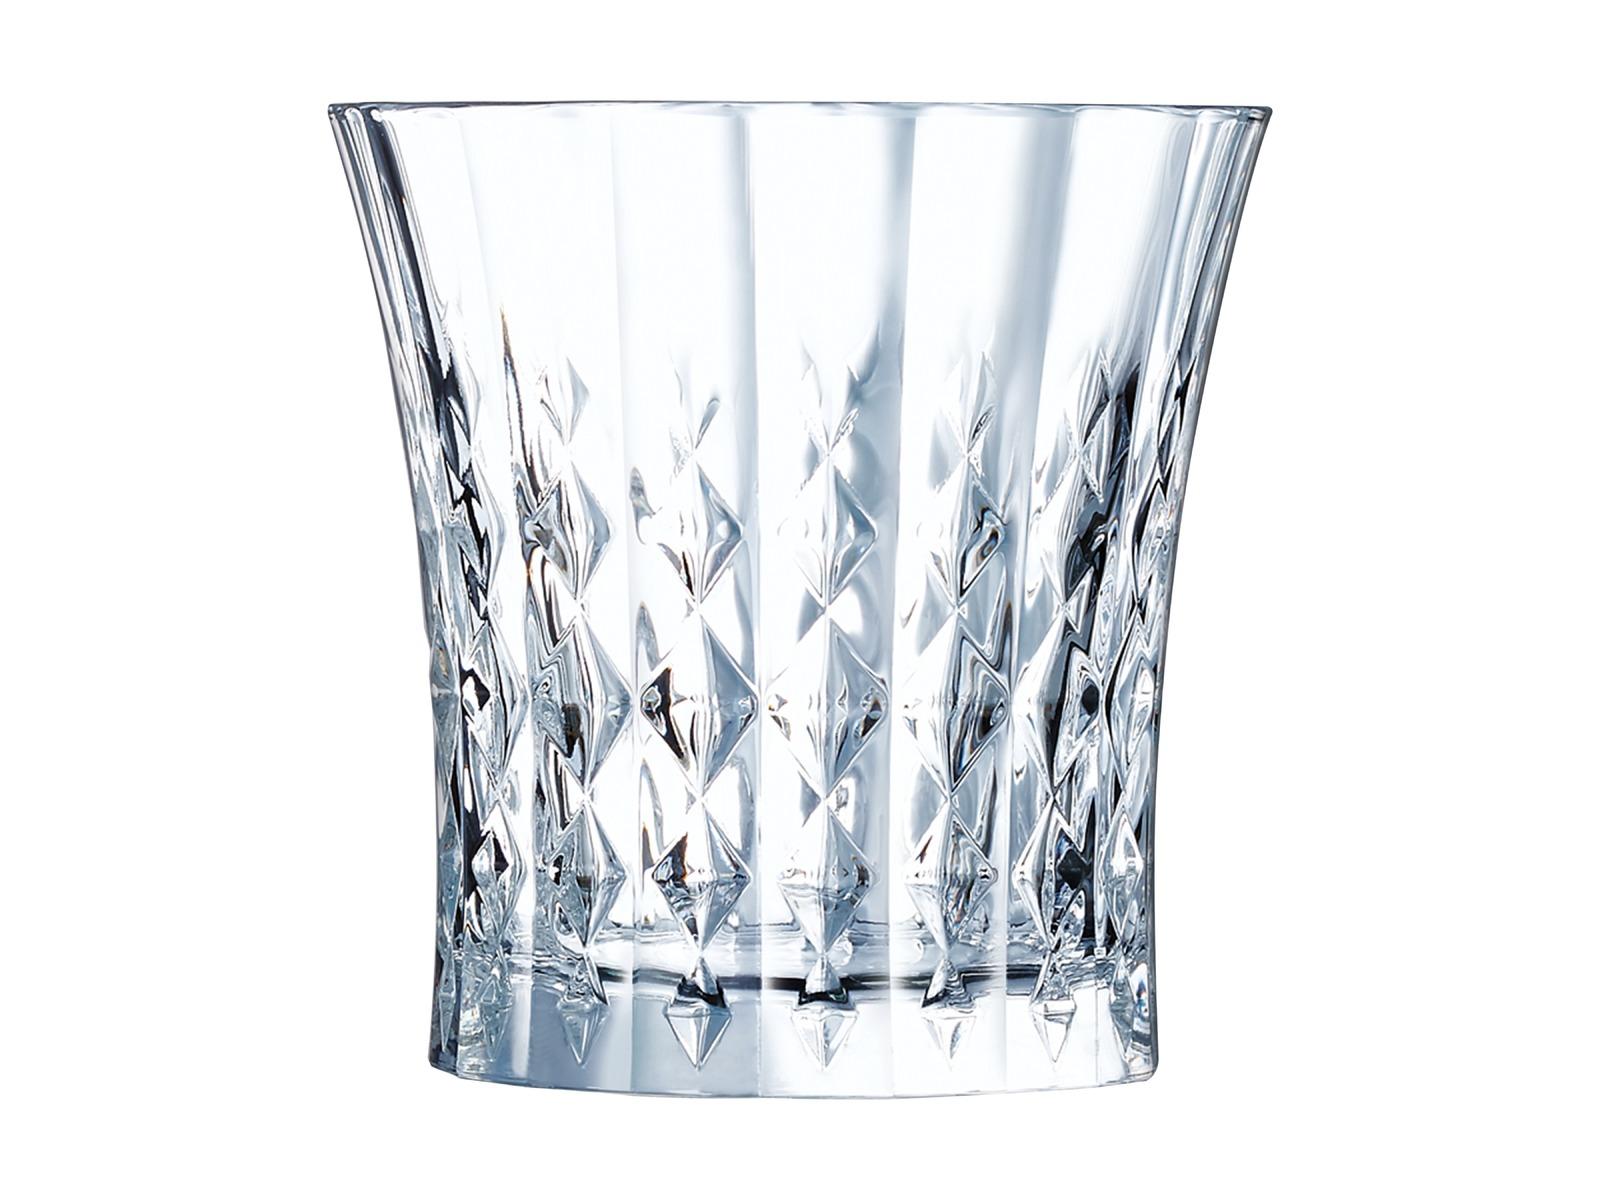 Cristal Darques Lady Diamond.Cristal D Arques Lady Diamond Old Fashioned Set Of 6 Tumblers 270ml